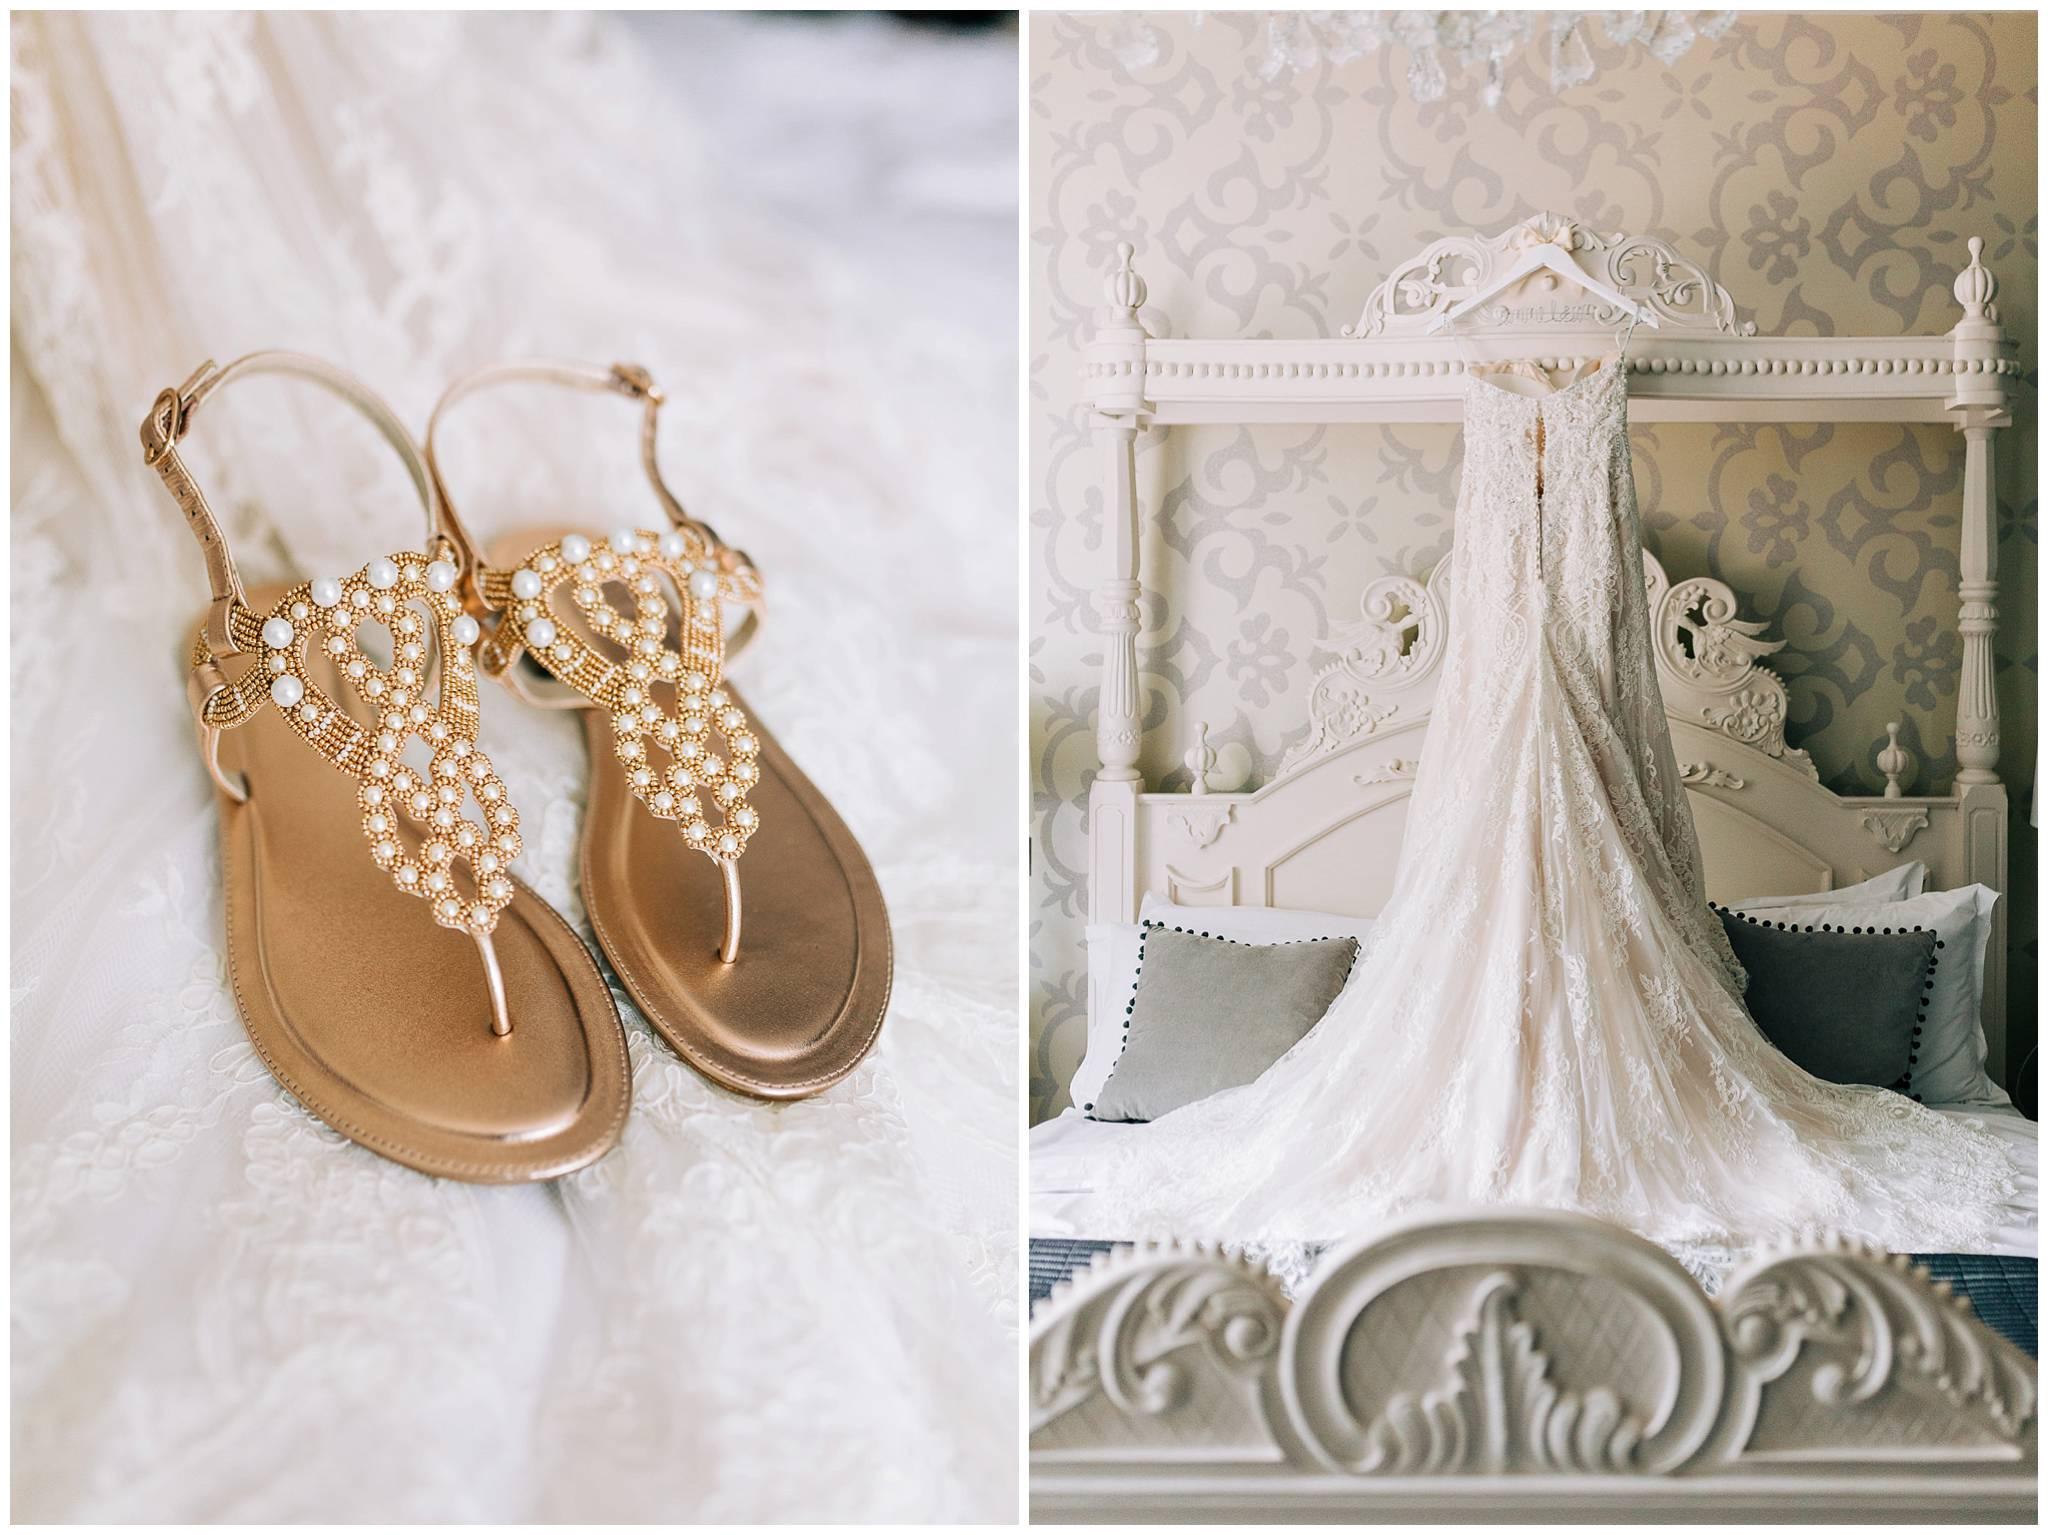 Summer Garden Wedding - The Old Vicarage Boutique Hotel3.jpg